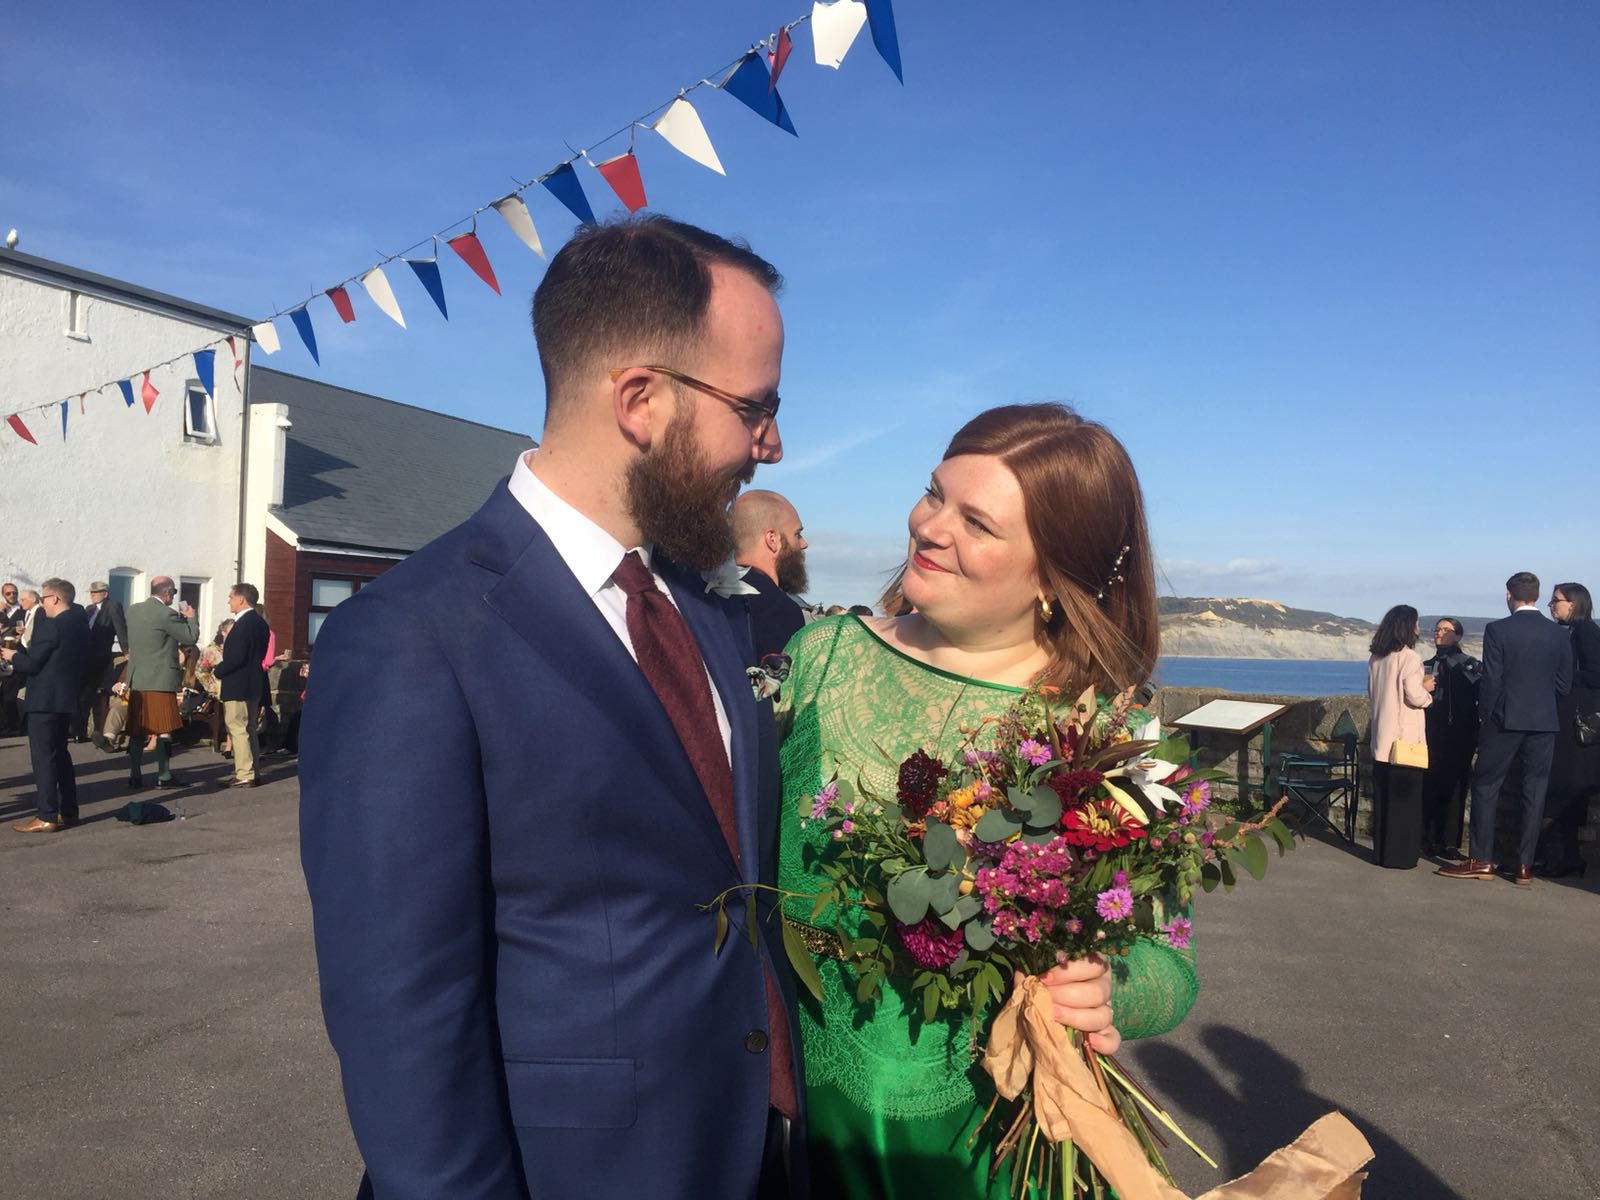 Lucy-Bespoke-Green-Silk-Lace-Wedding-Dress-Kate-Beaumont-Sheffield-a-7.jpg